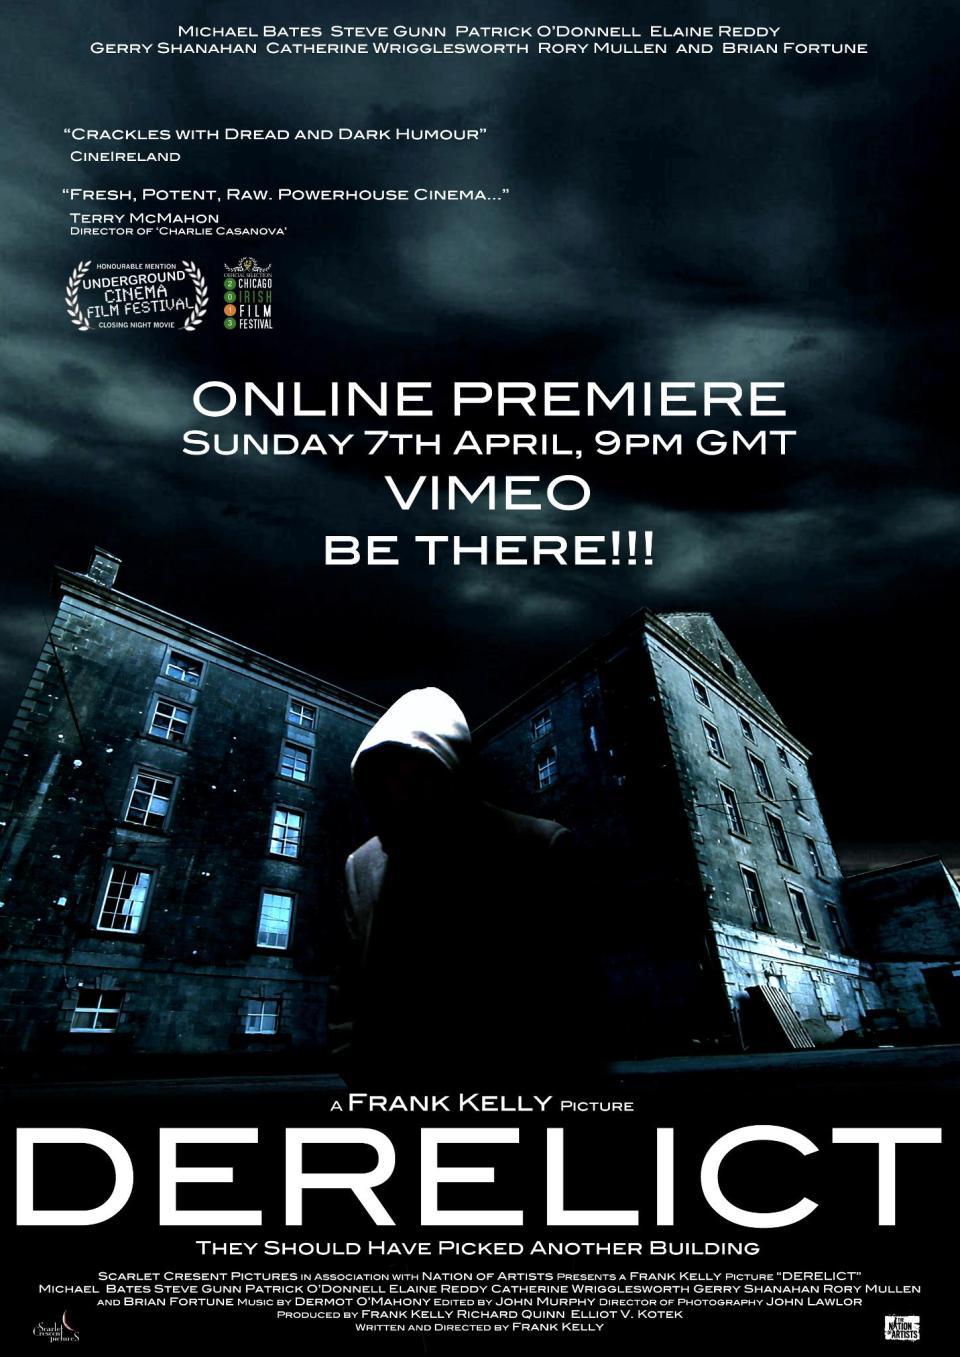 derelict vimeo